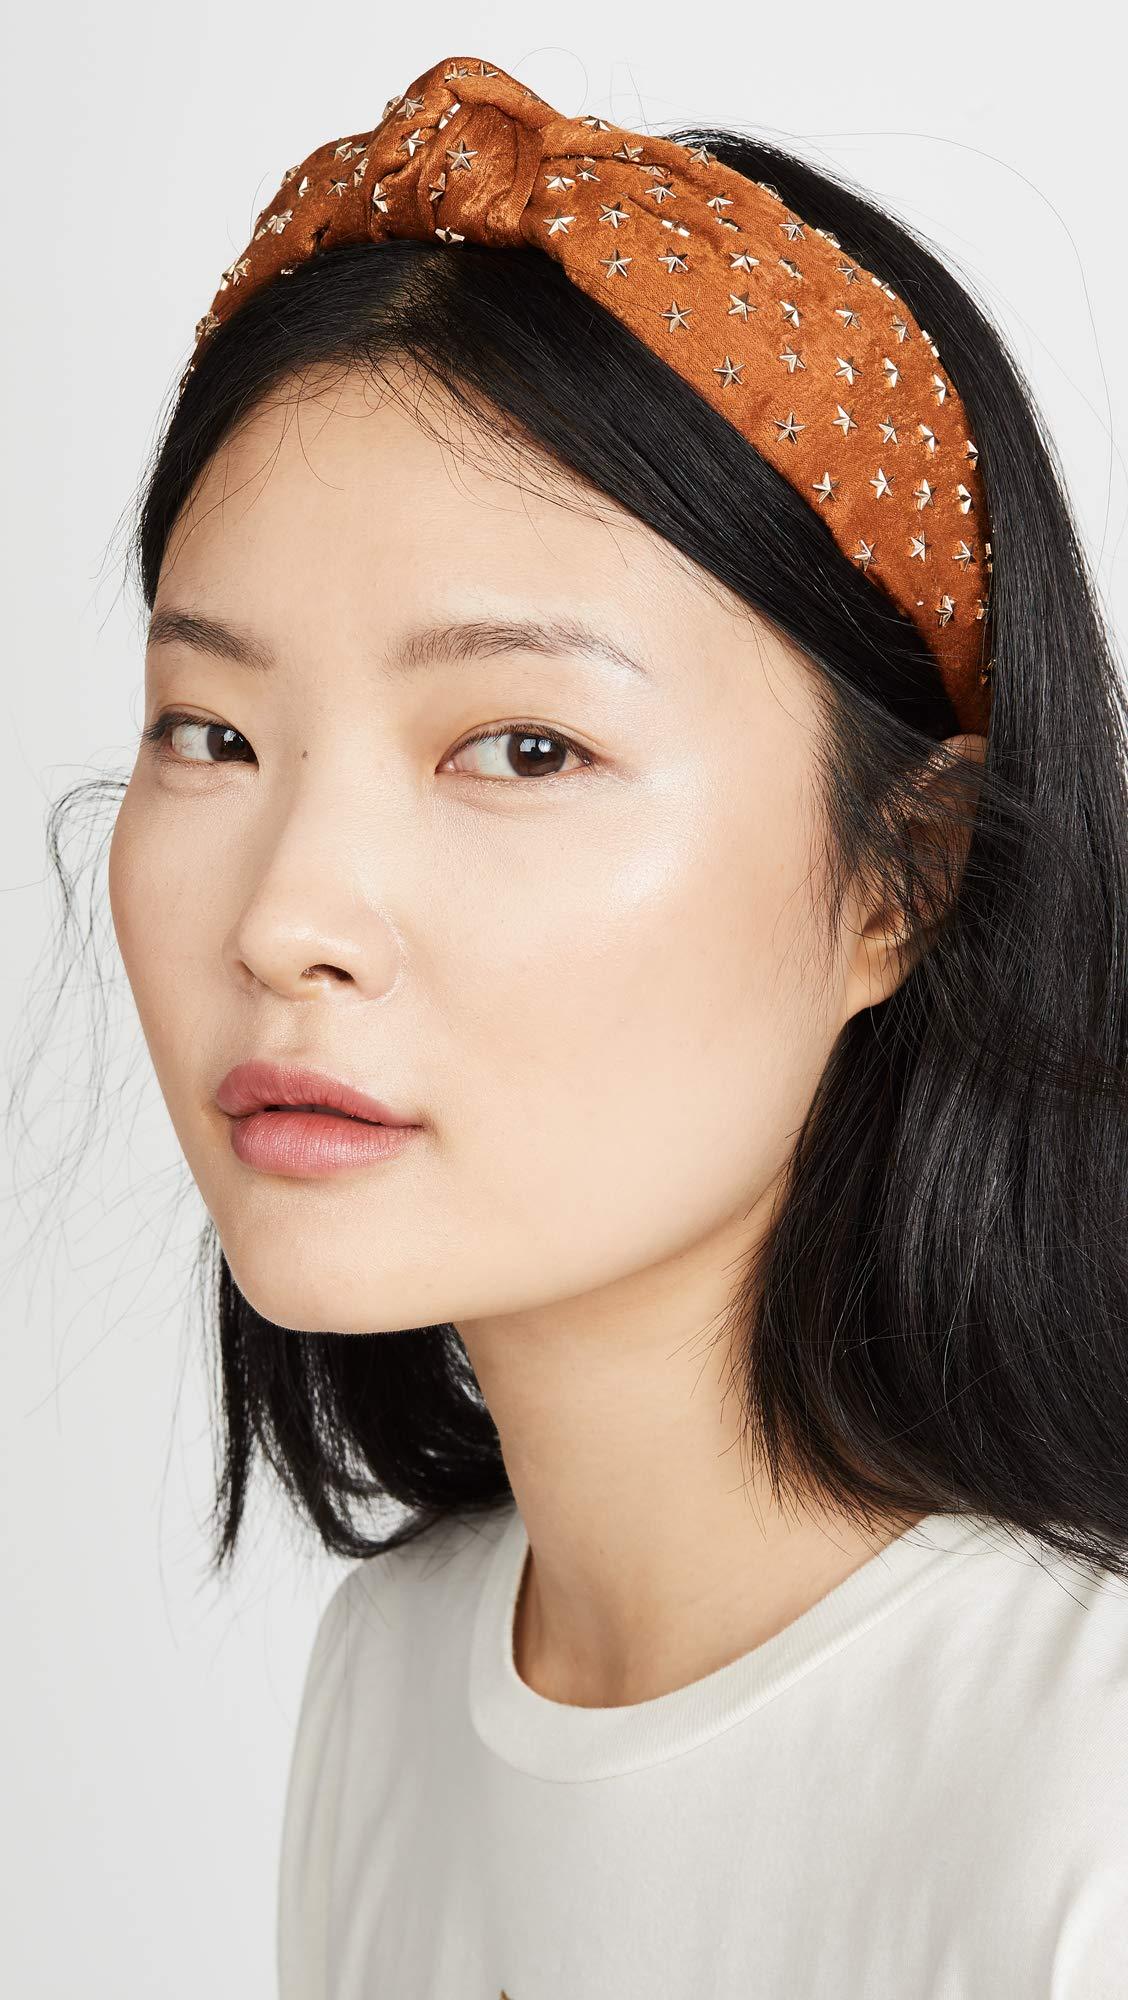 Lele Sadoughi Women's Star Studded Silk Knotted Headband, Copper, Metallic, Bronze, Orange, One Size by Lele Sadoughi (Image #3)